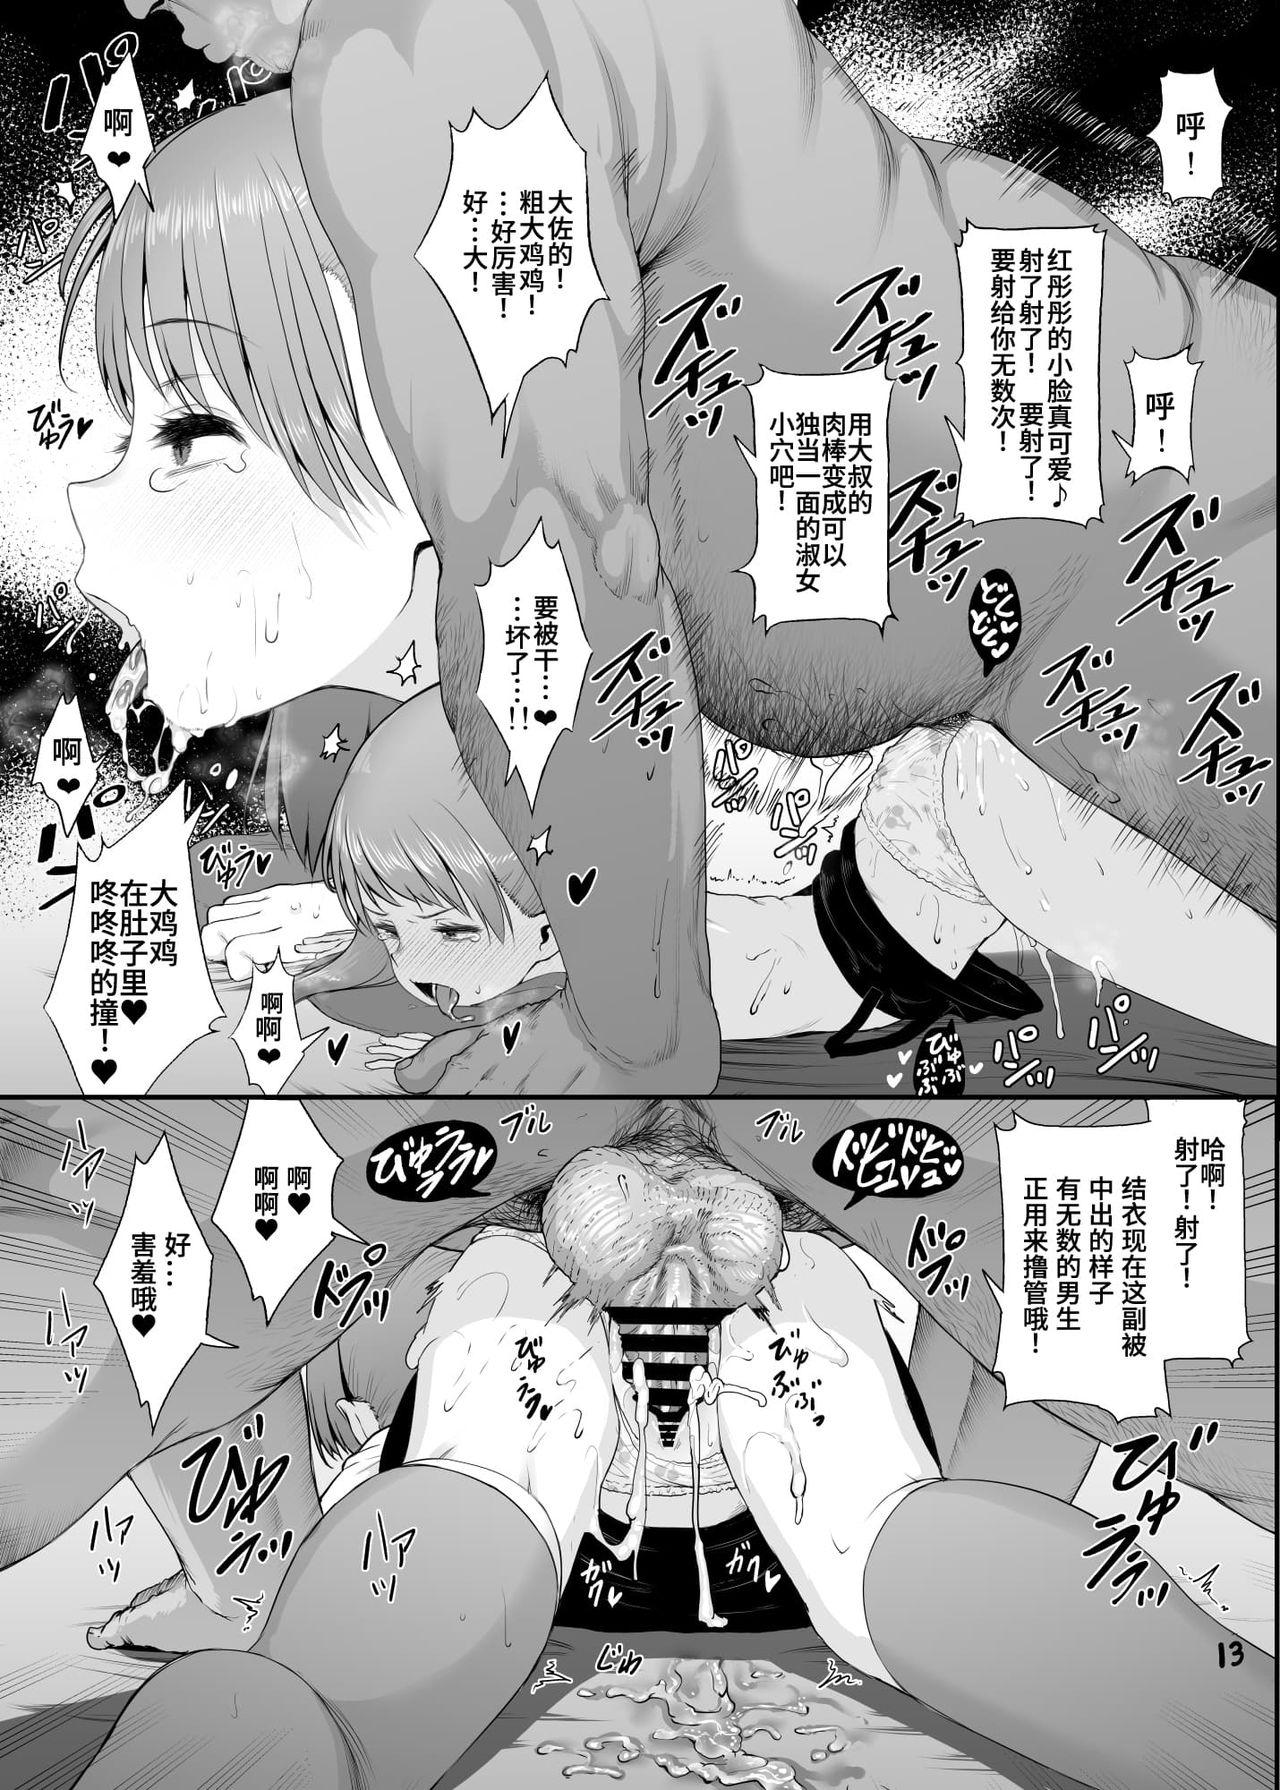 [E-lse (Yuzu Machi)] Sacchan Yui-chan Kotoha-chan to Okashi de Nakayoku Naru Hon (Mitsuboshi Colors) [Chinese] [Digital] 11